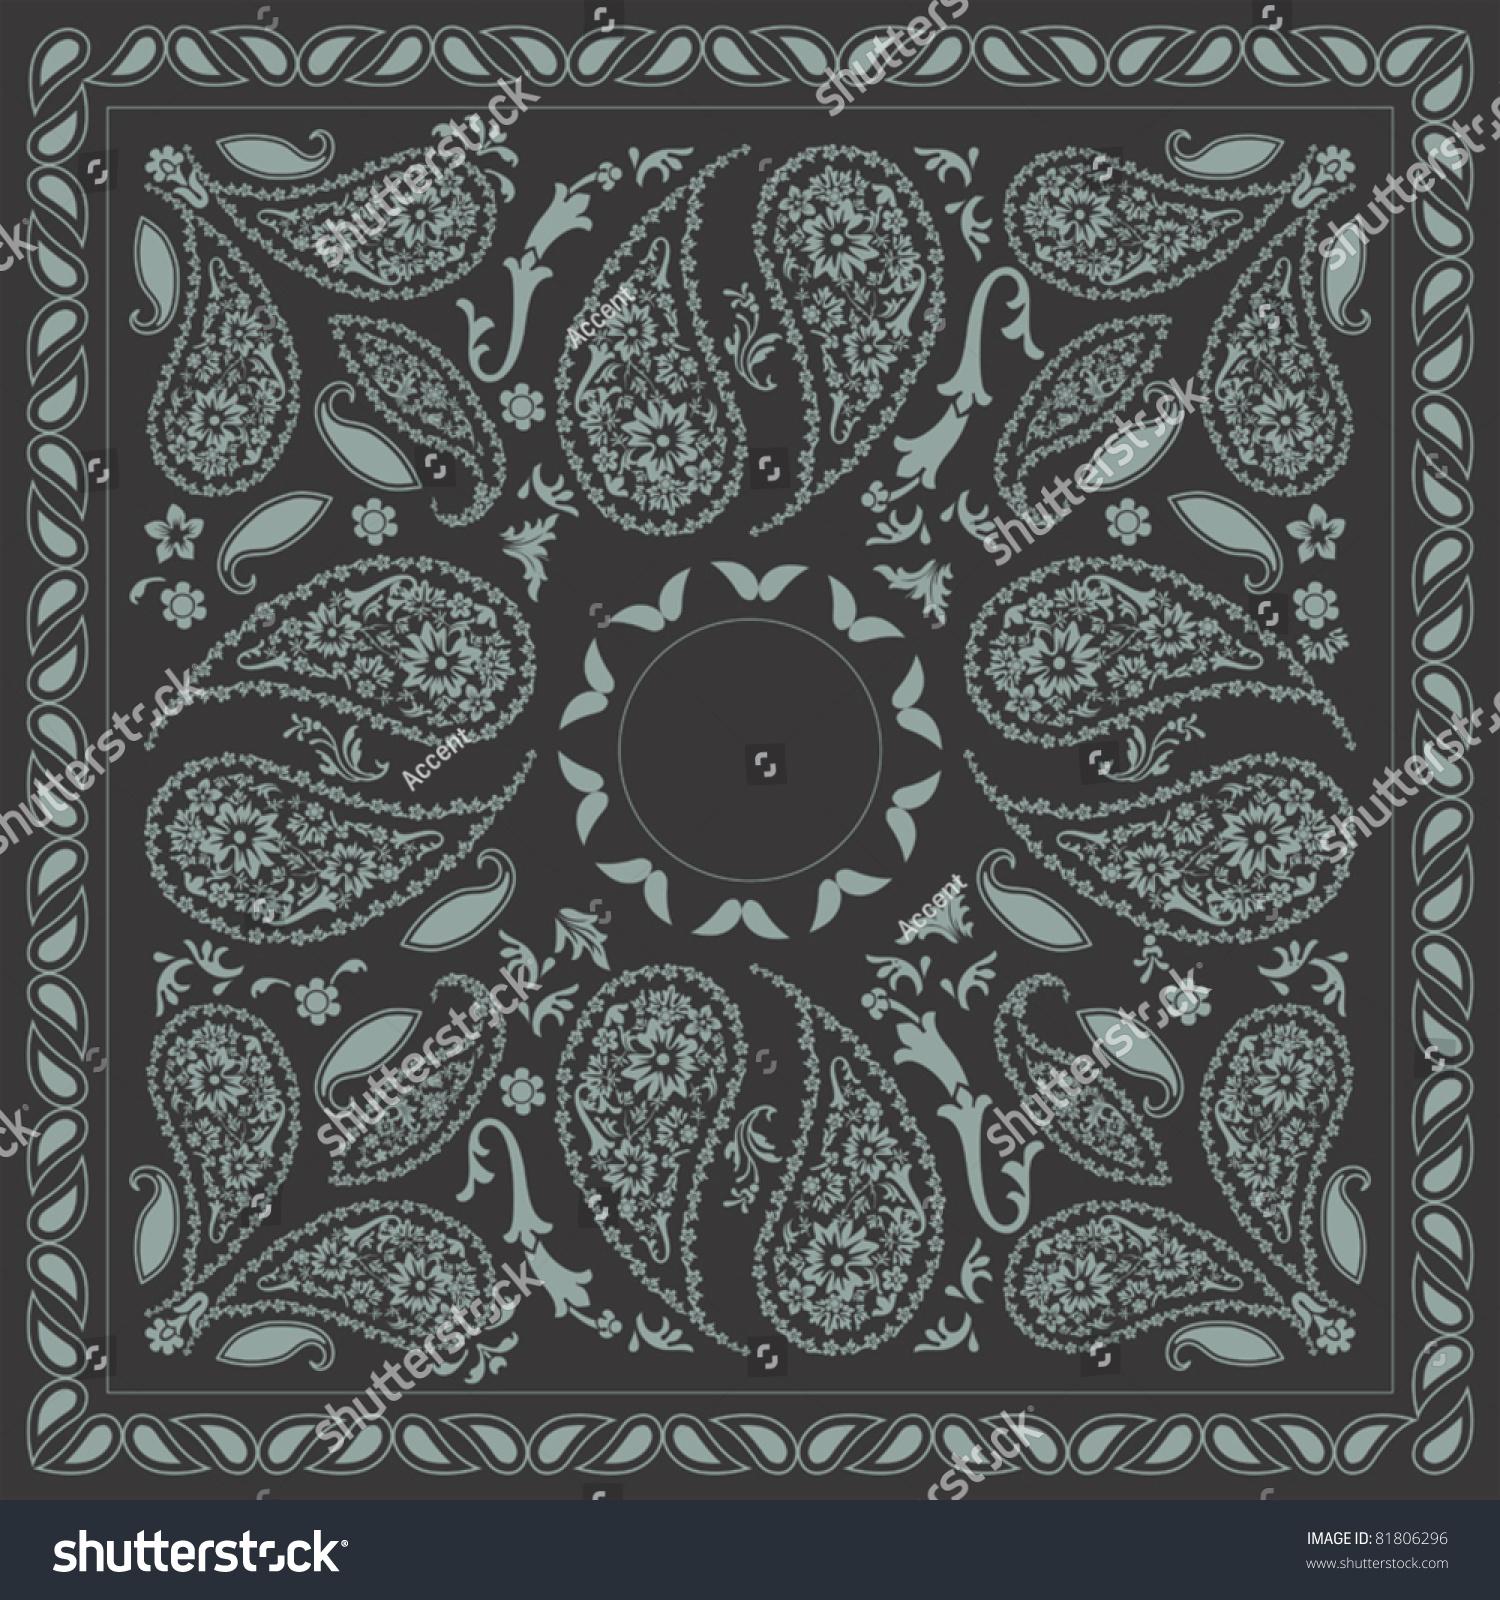 Bicolor Paisley Bandana Design Stock Vector 81806296 - Shutterstock